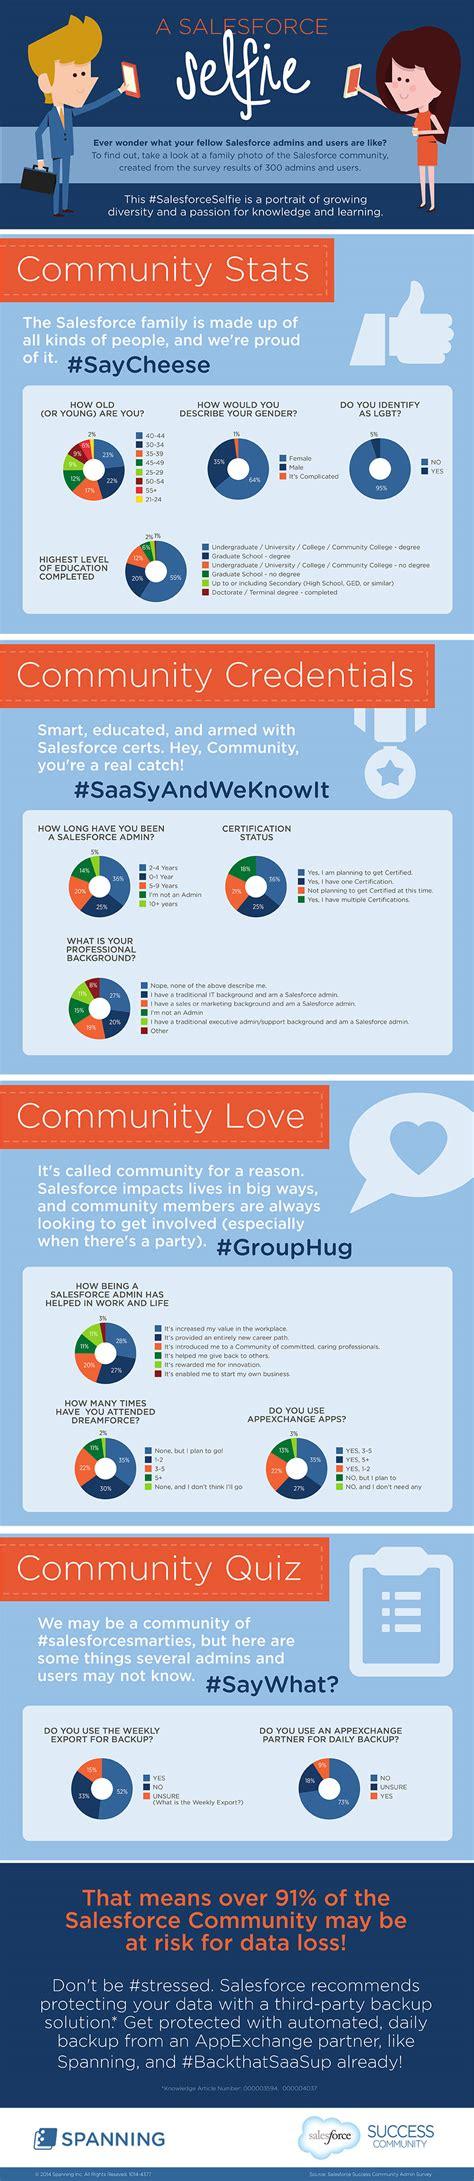 Salesforce Background Check Salesforceselfie A Look Into The Diverse Salesforce Community